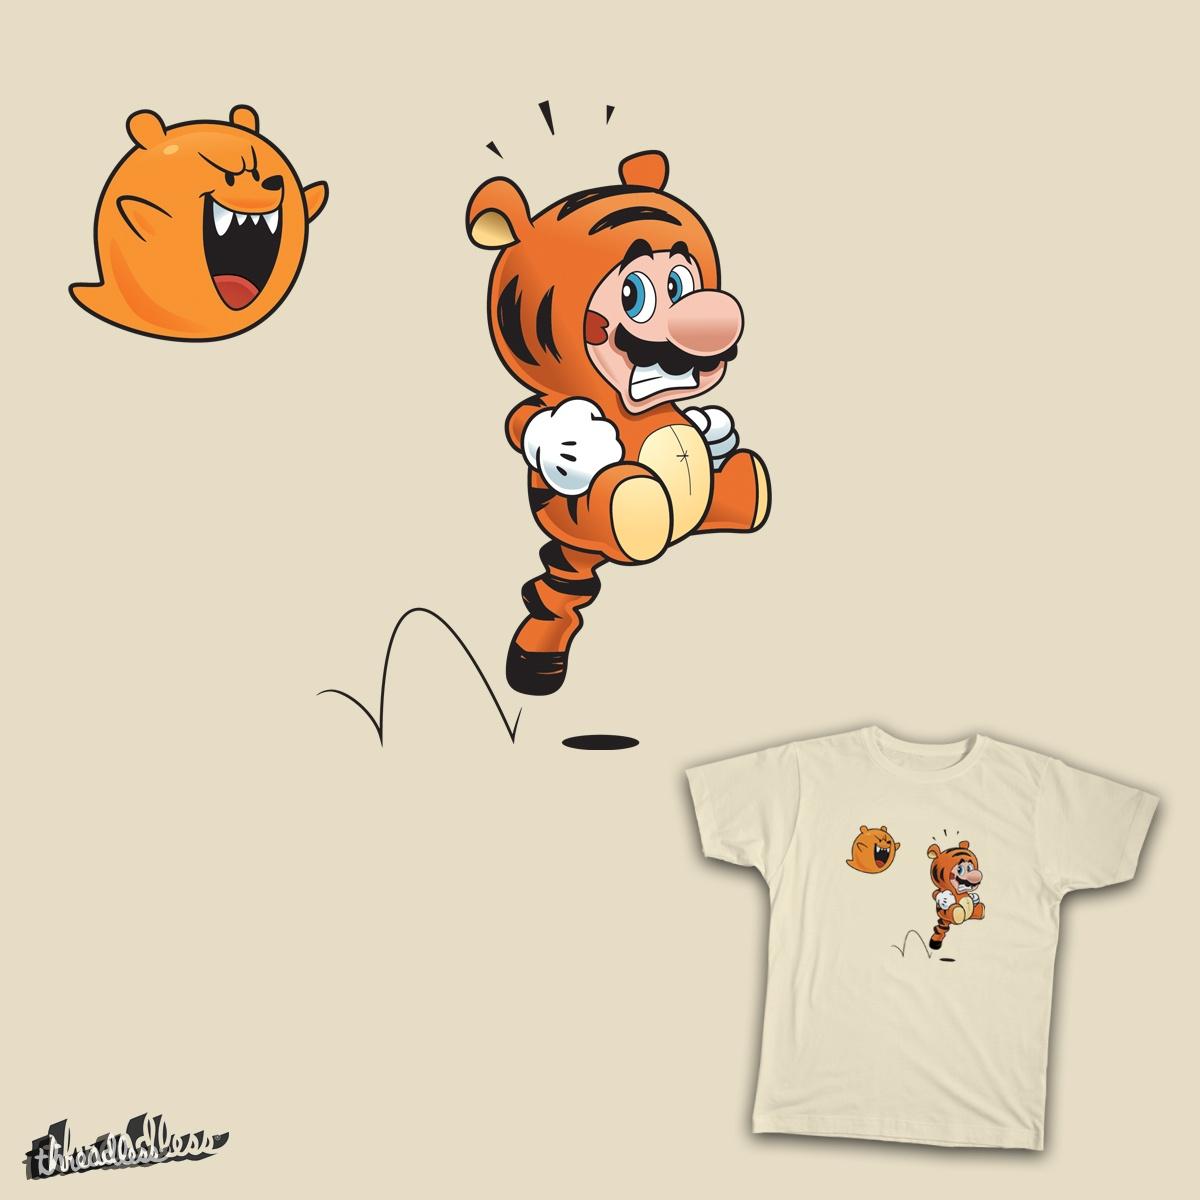 Winnie the Boo! by Koomer on Threadless